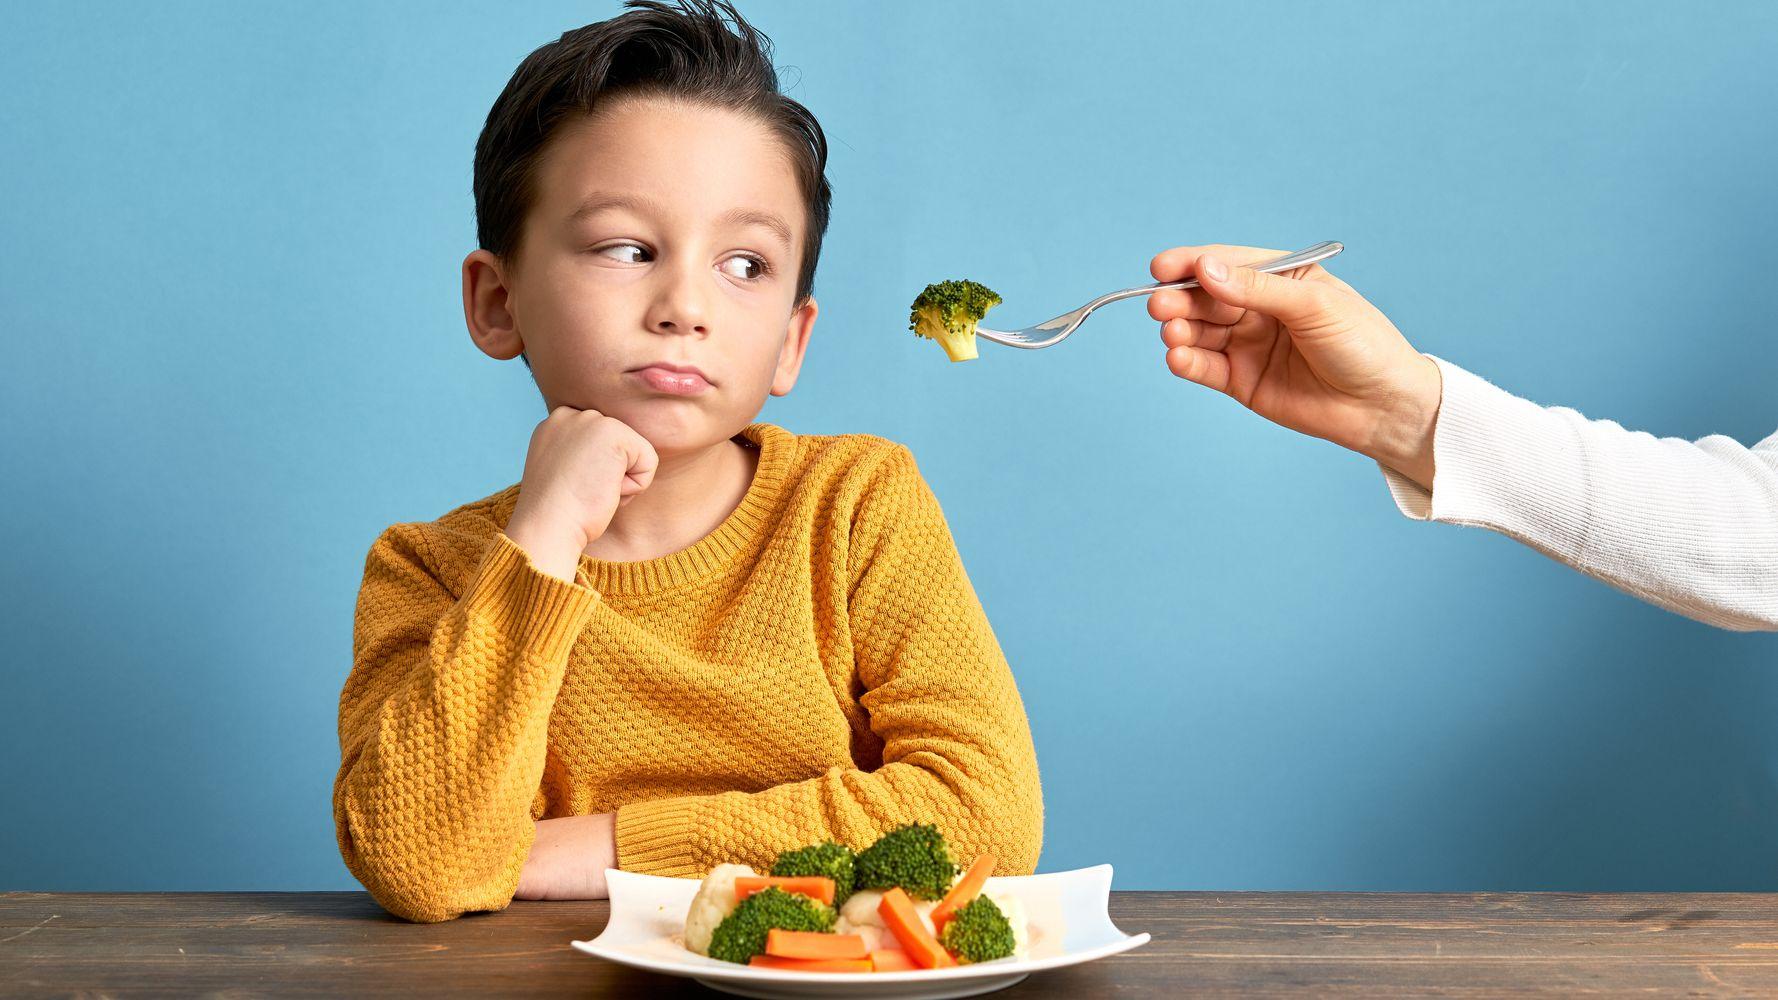 La dieta keto aumenta el colesterol